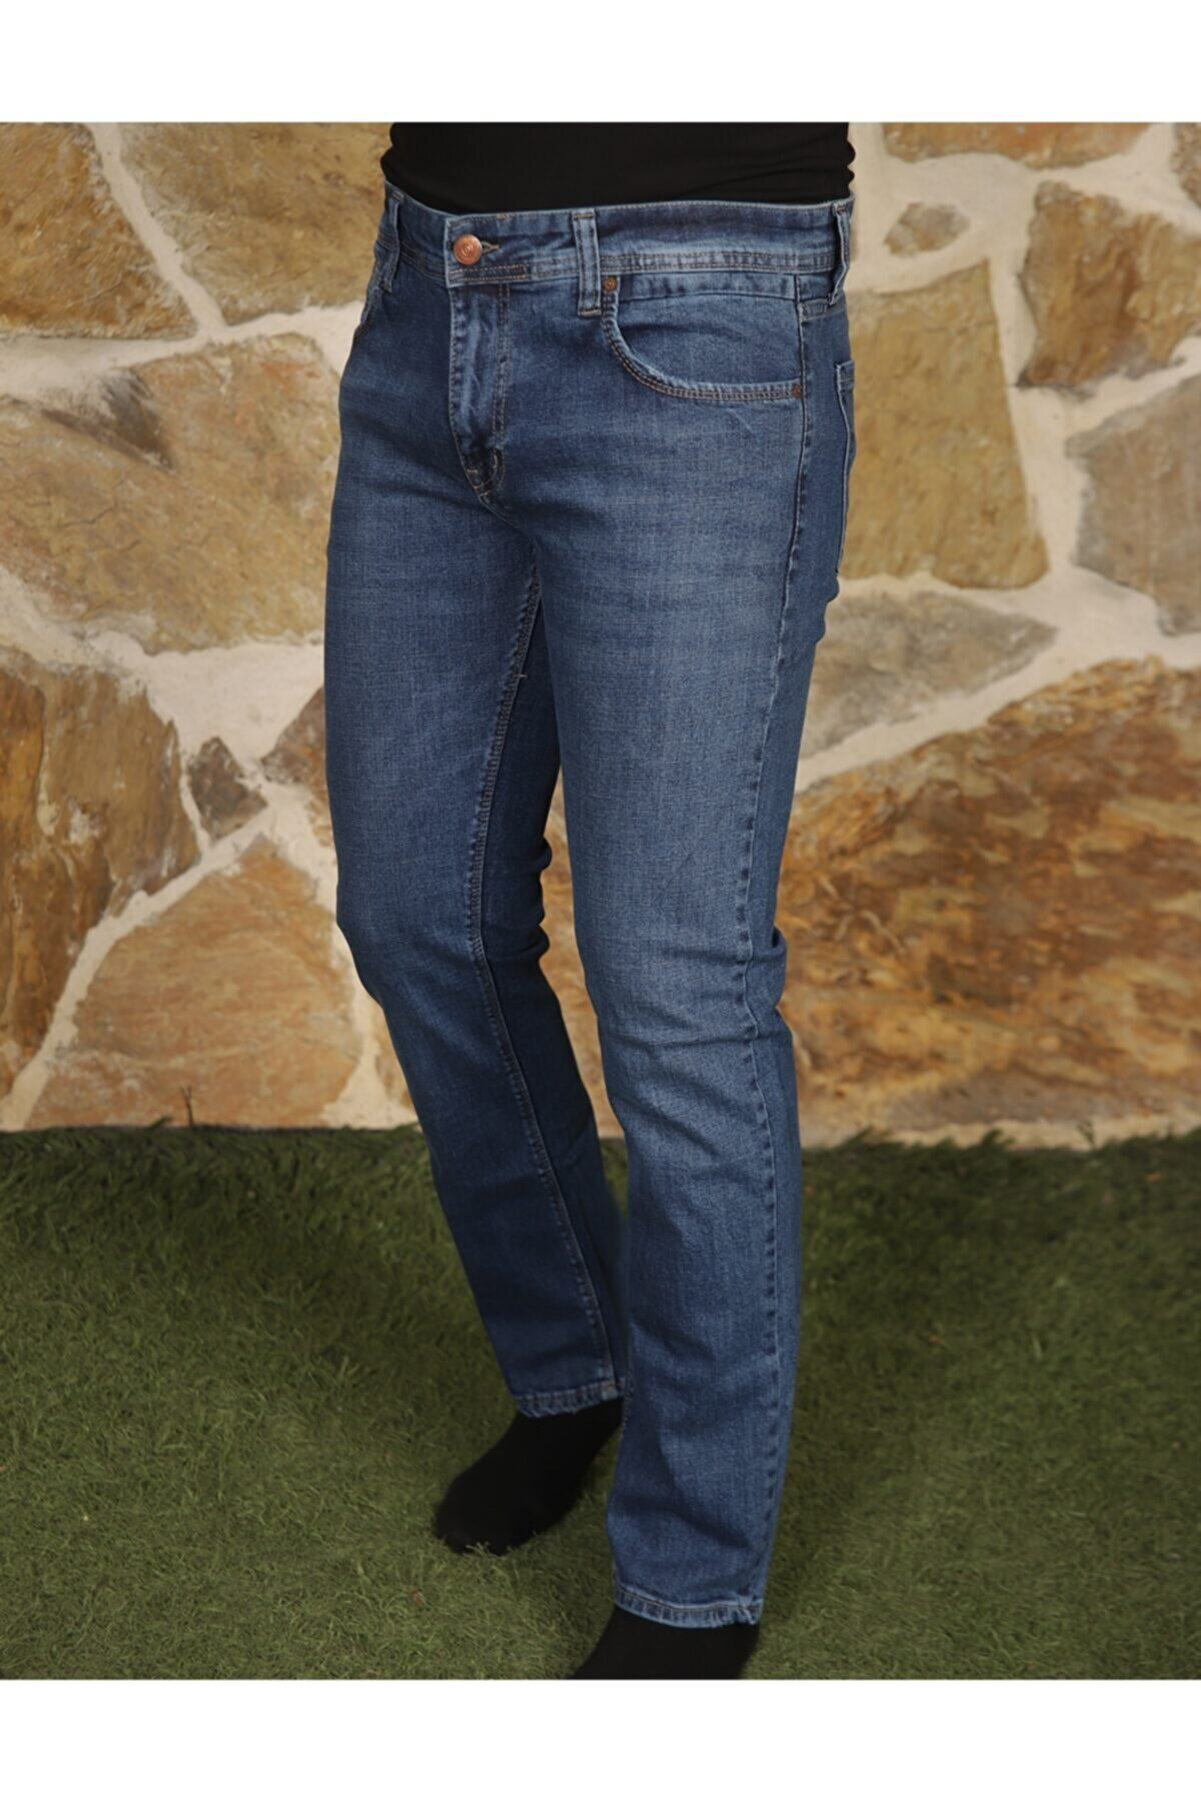 REAXION DENIM Erkek Mavi Denim Regular Fit Jeans Rx0634